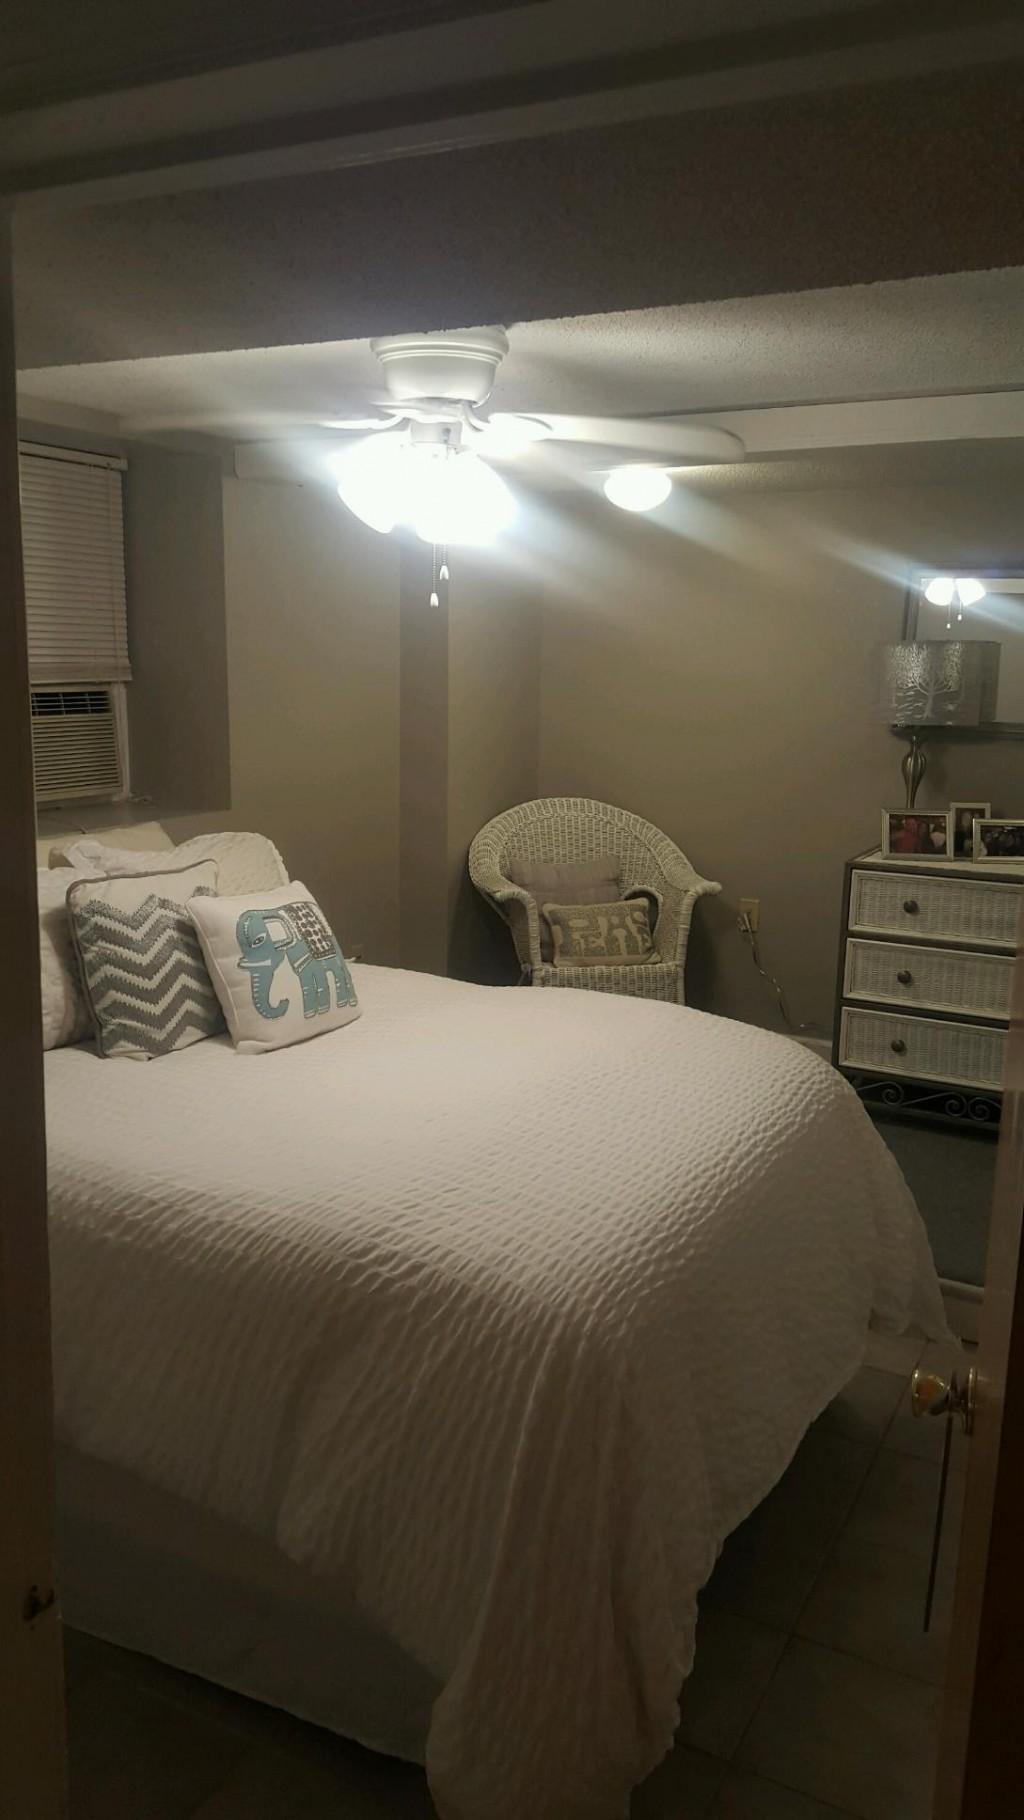 Enjoyable Apartment For Rent Dunmore Placefinder Complacefinder Com Home Interior And Landscaping Ologienasavecom